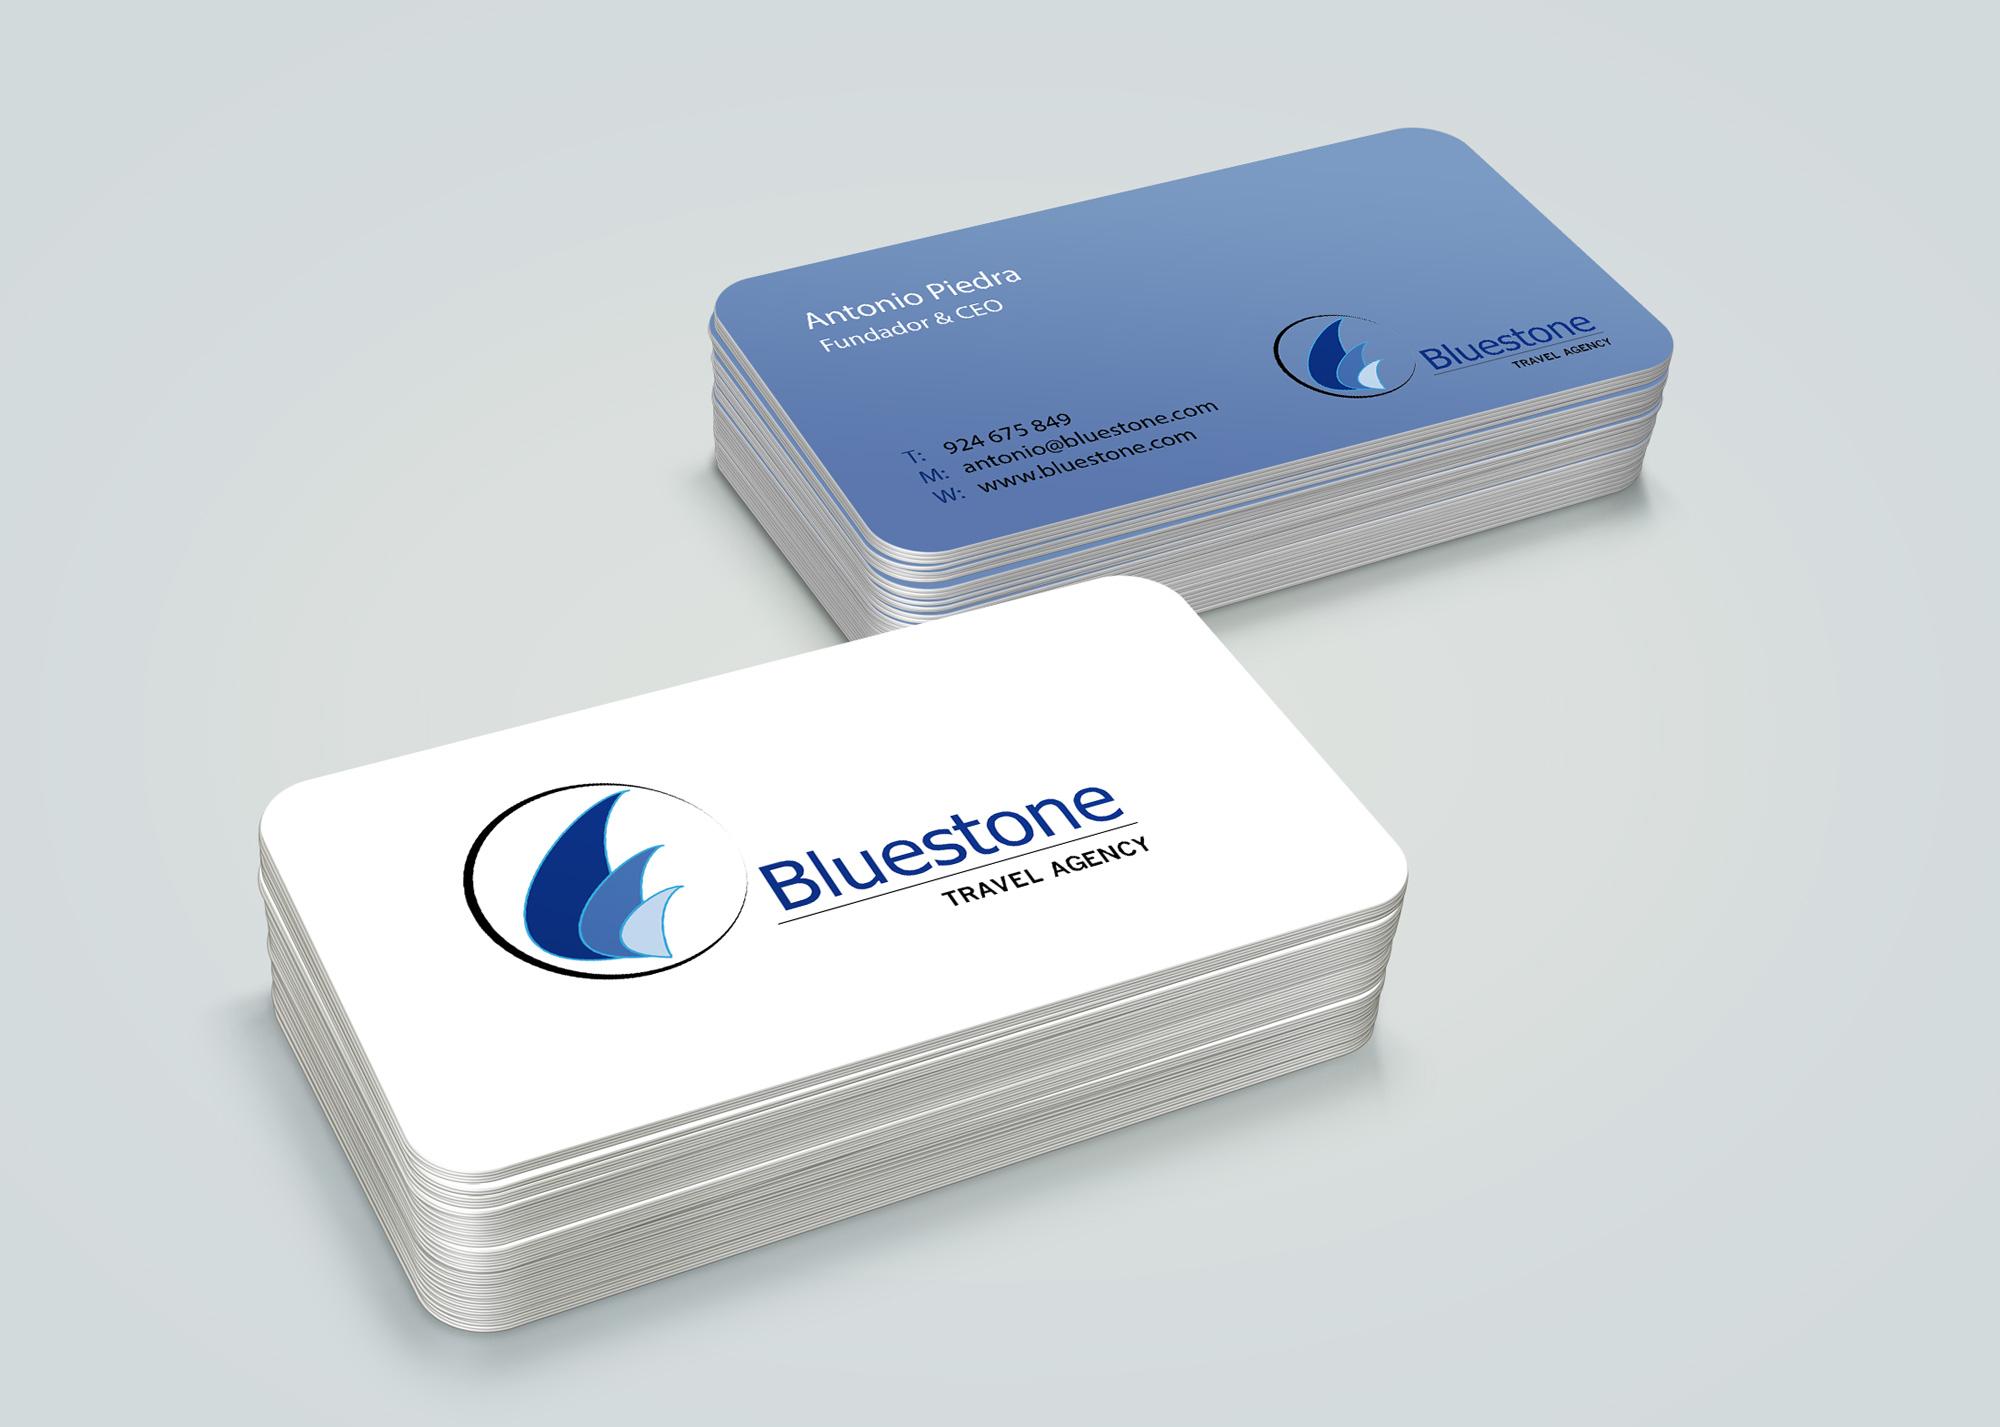 Bluestone business cards